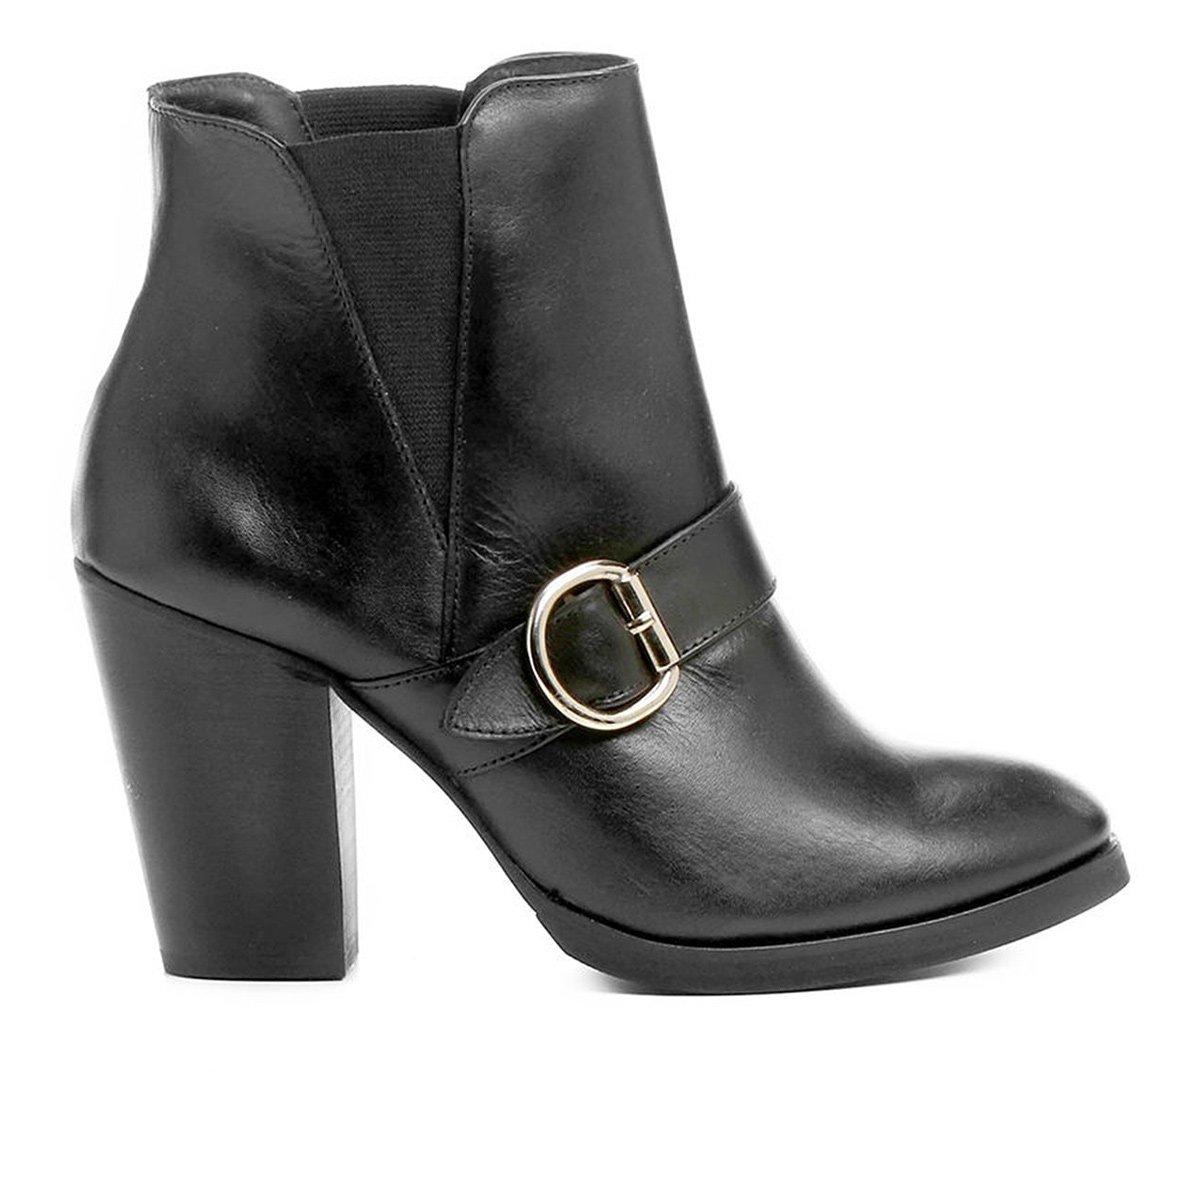 0d7e4eebf7 Bota Couro Cano Curto Shoestock Fivela Feminina